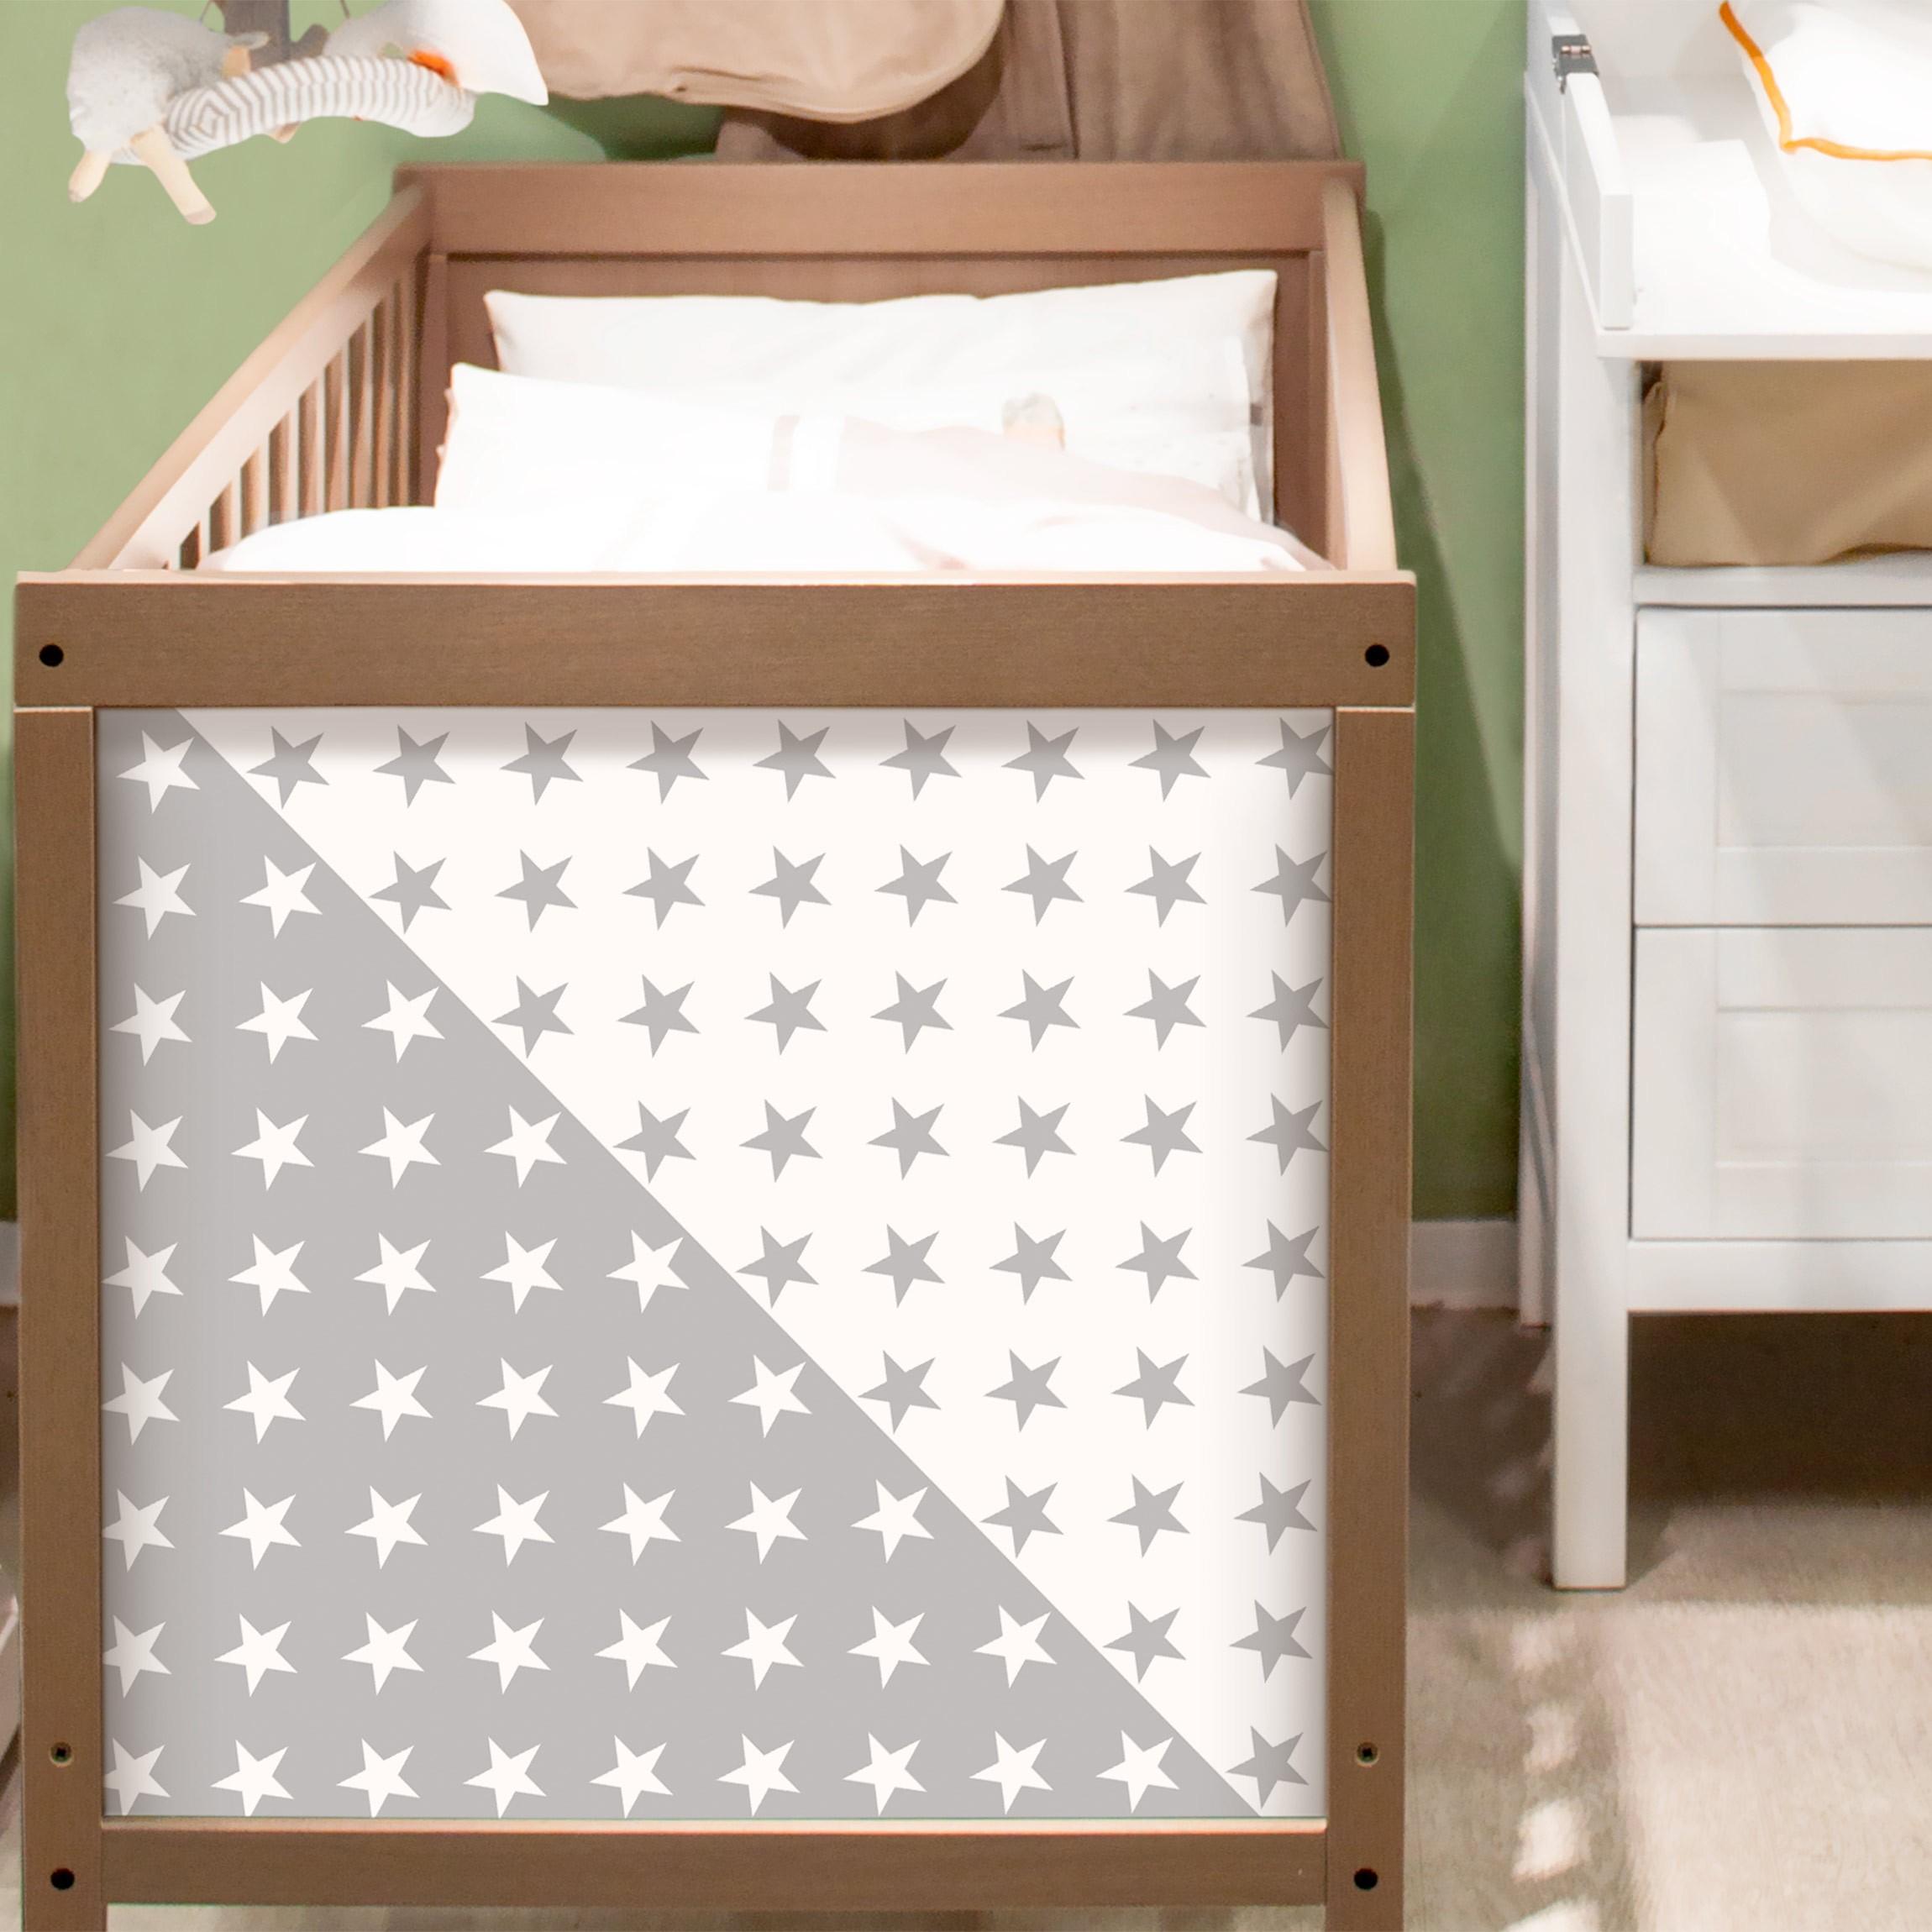 klebefolie sterne musterset in grau und wei dekofolie. Black Bedroom Furniture Sets. Home Design Ideas